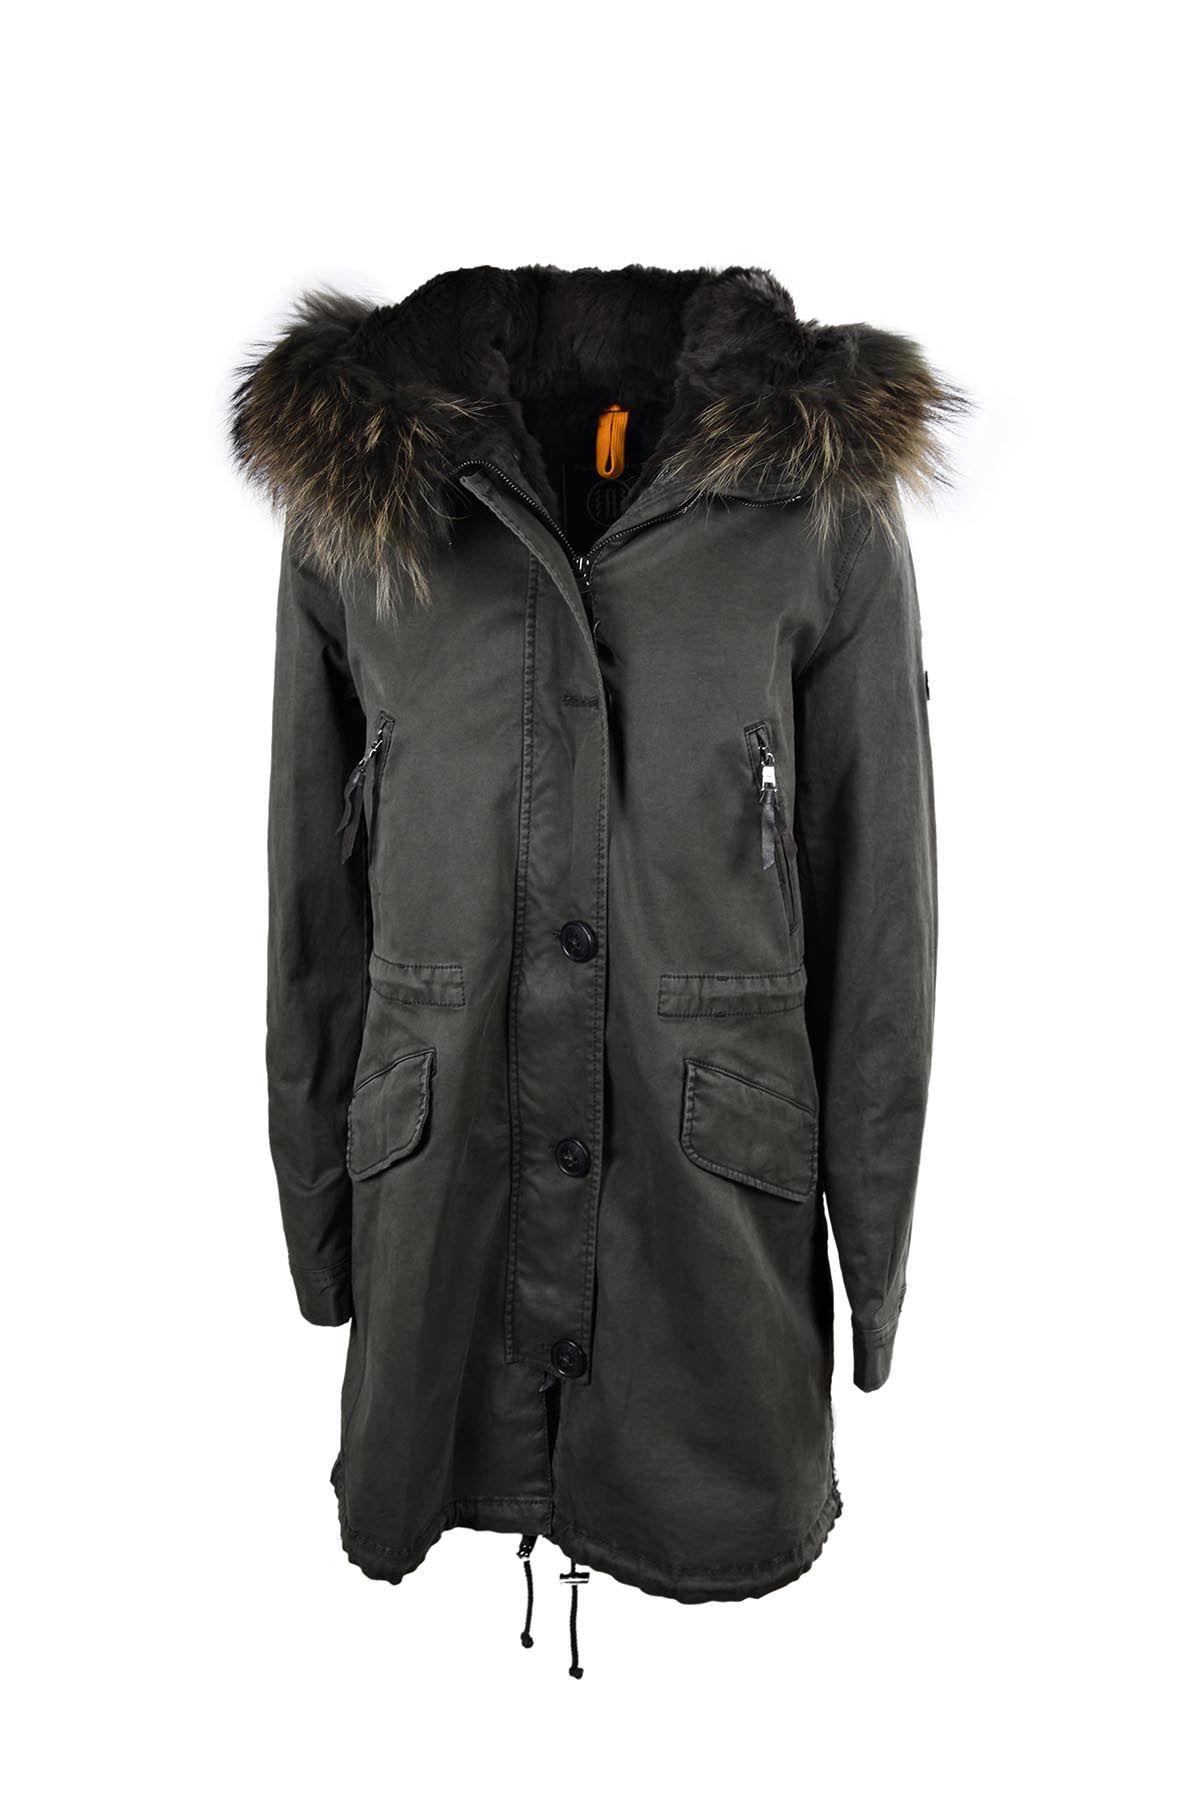 Aspen Total Fur Coat In Night Green Dtm Parka Coat Winter Jackets